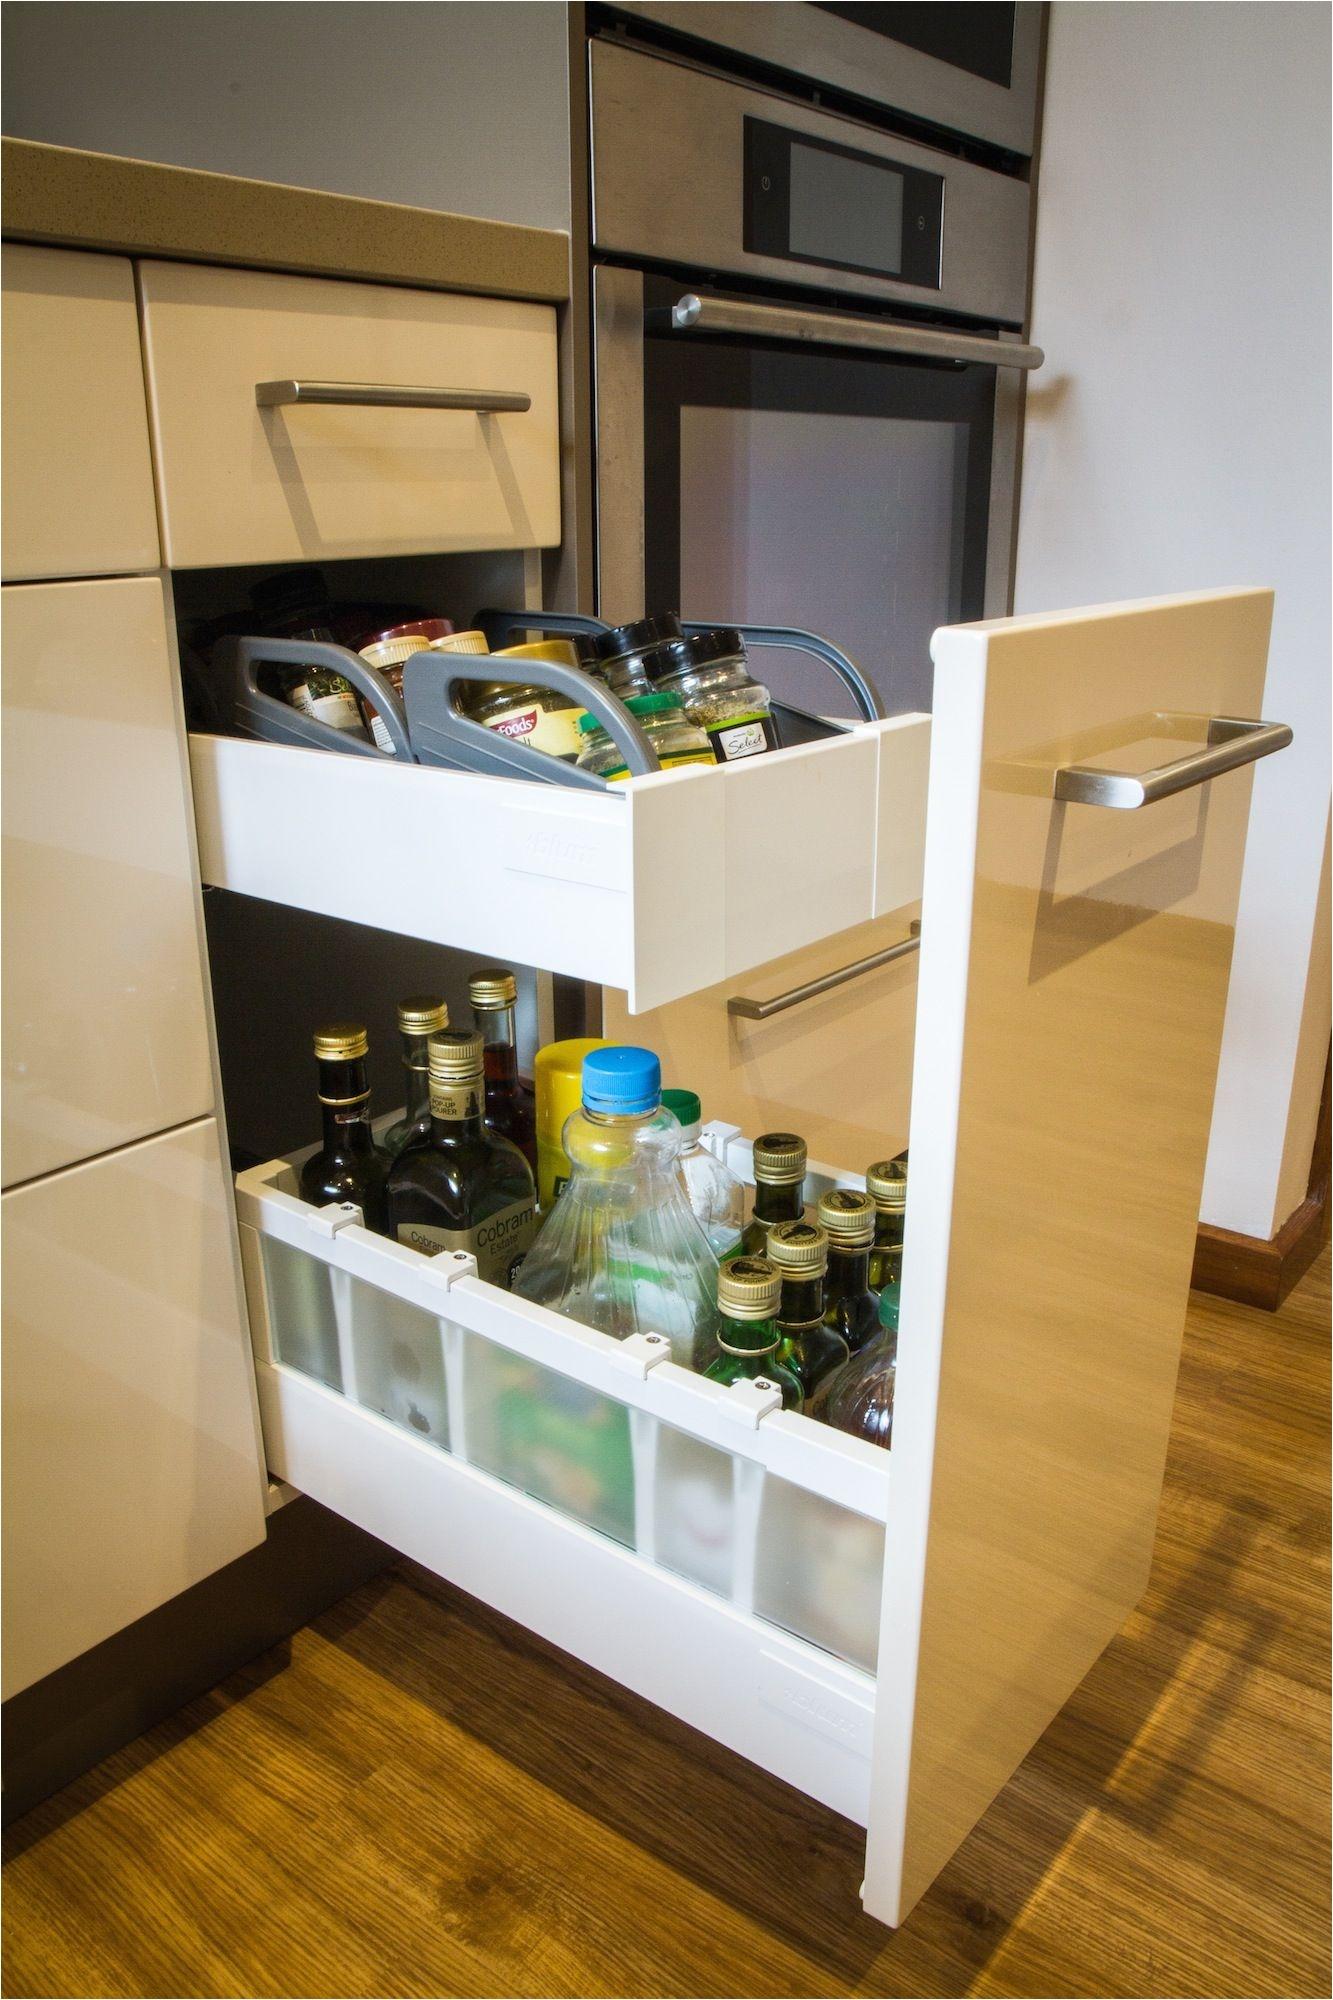 oil drawer spice drawer hidden drawer www thekitchendesigncentre com au